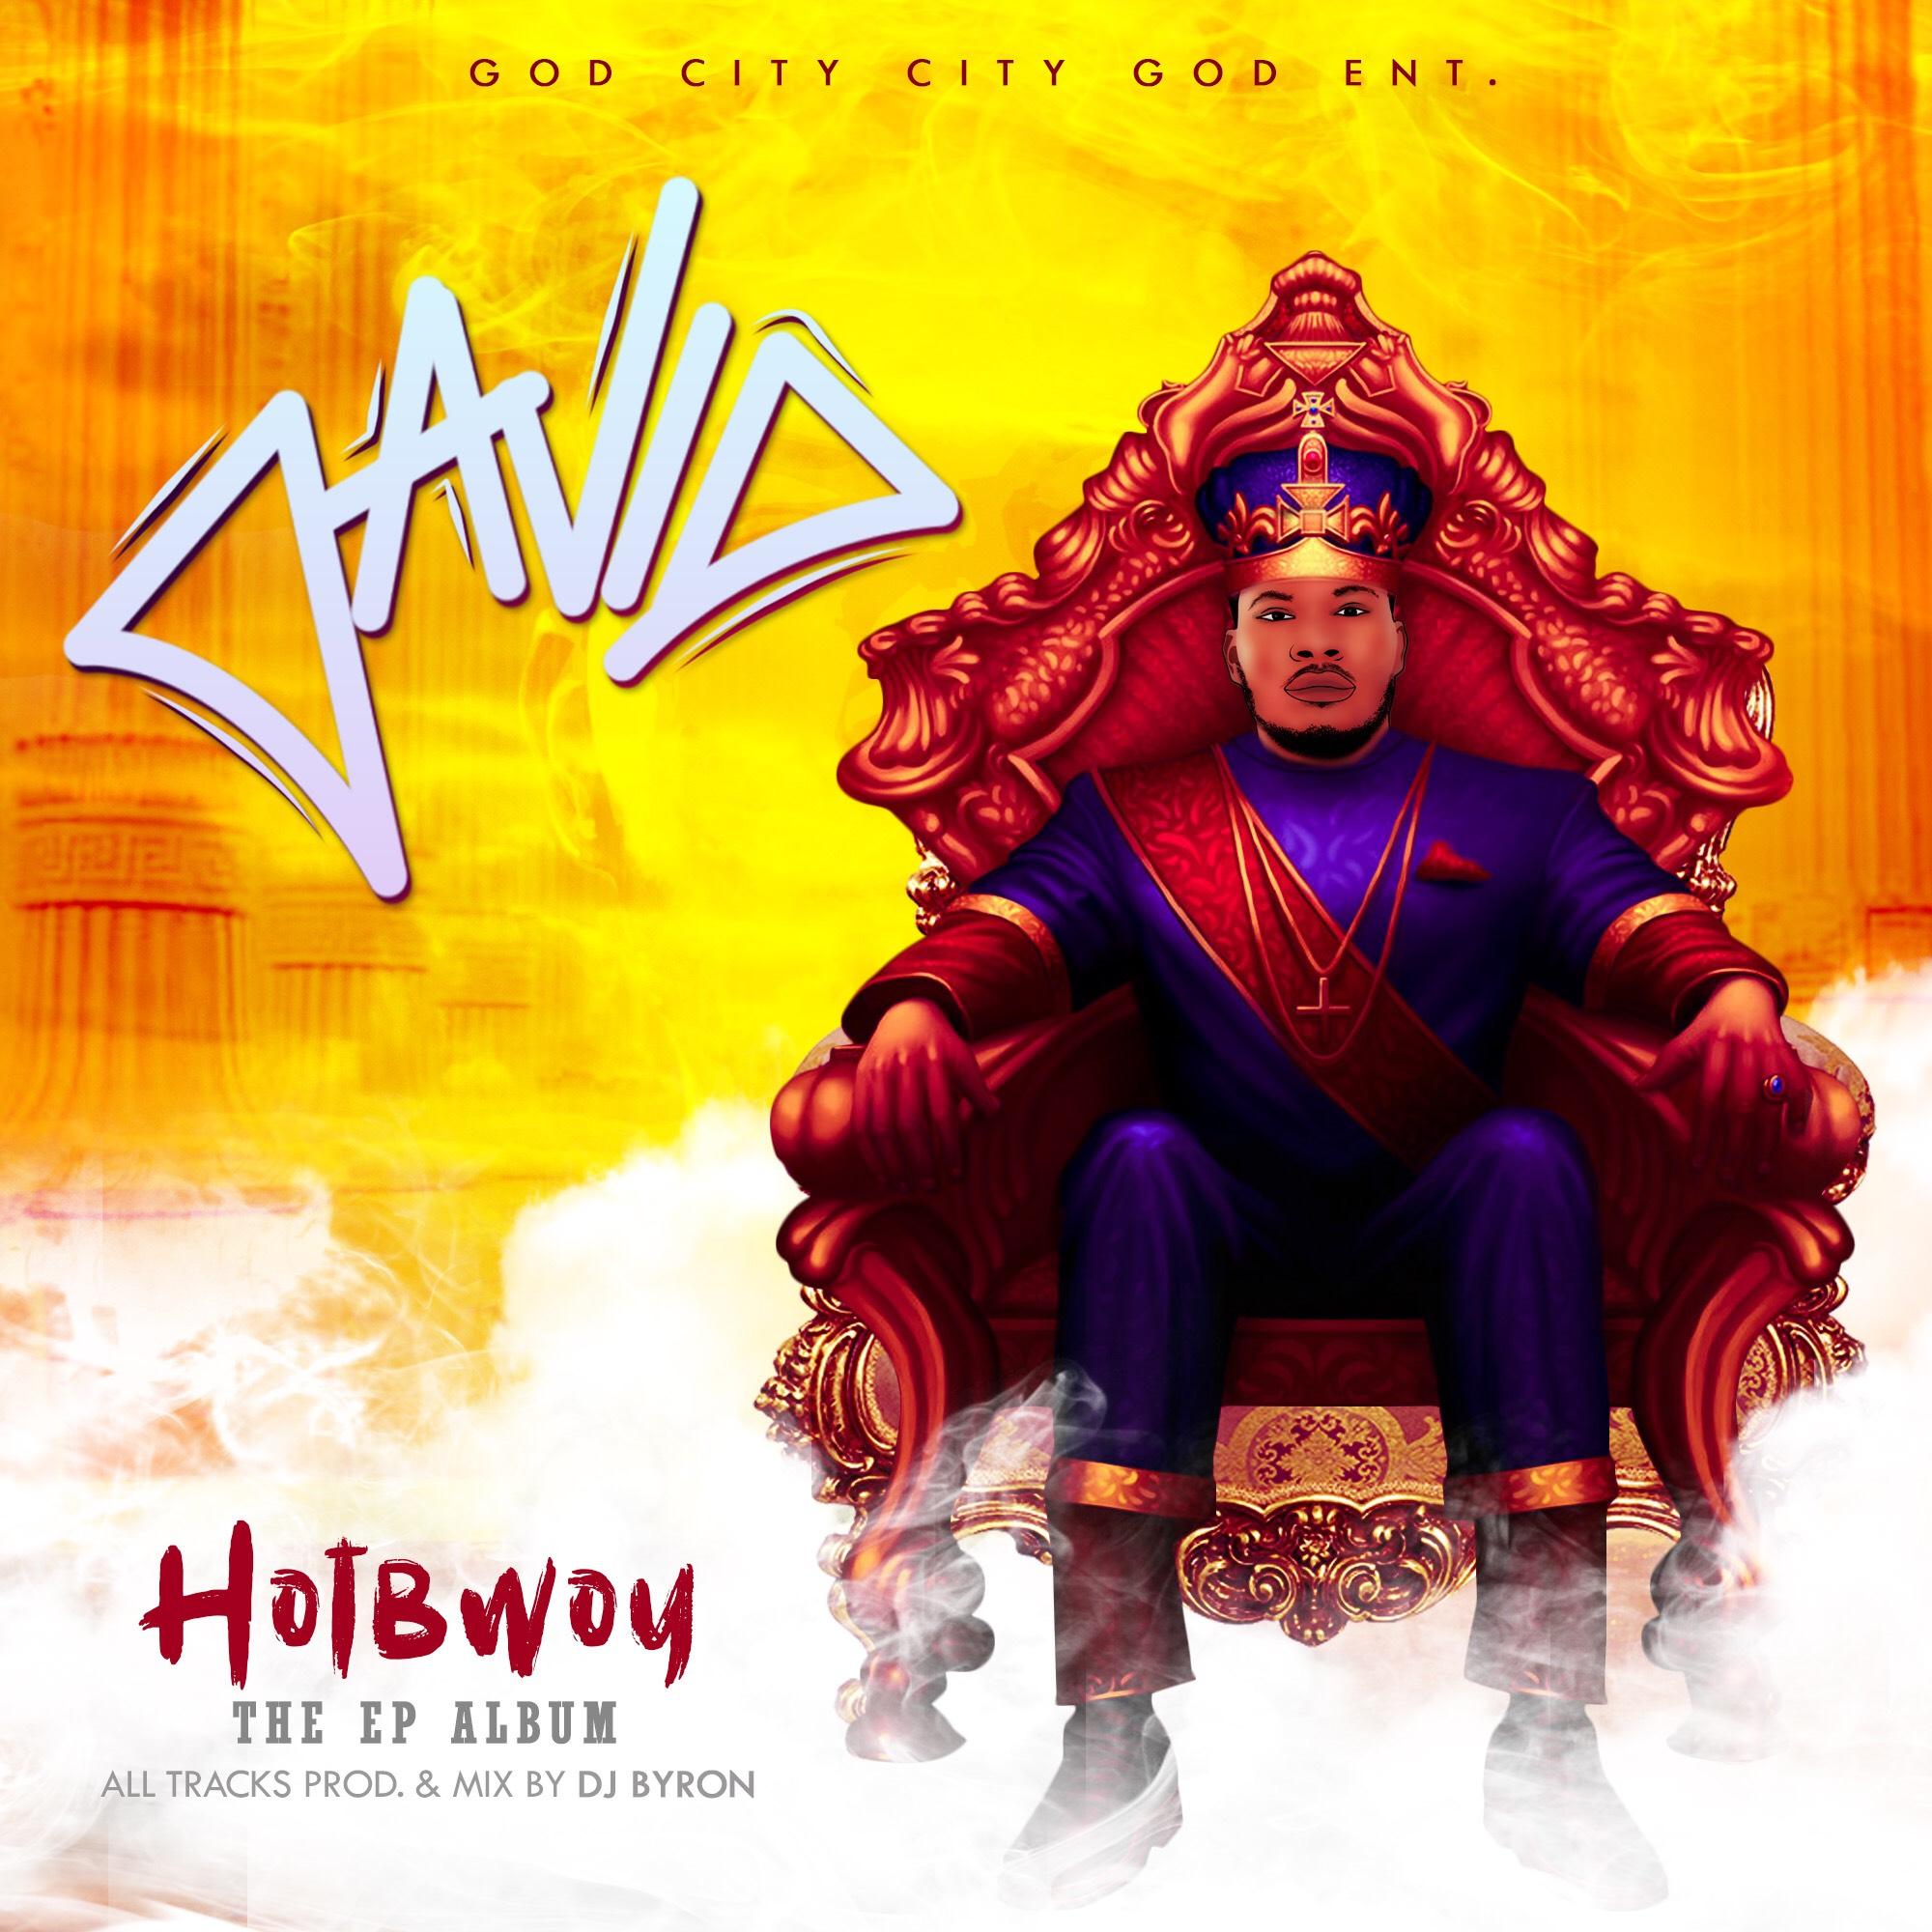 HotBwoy - David